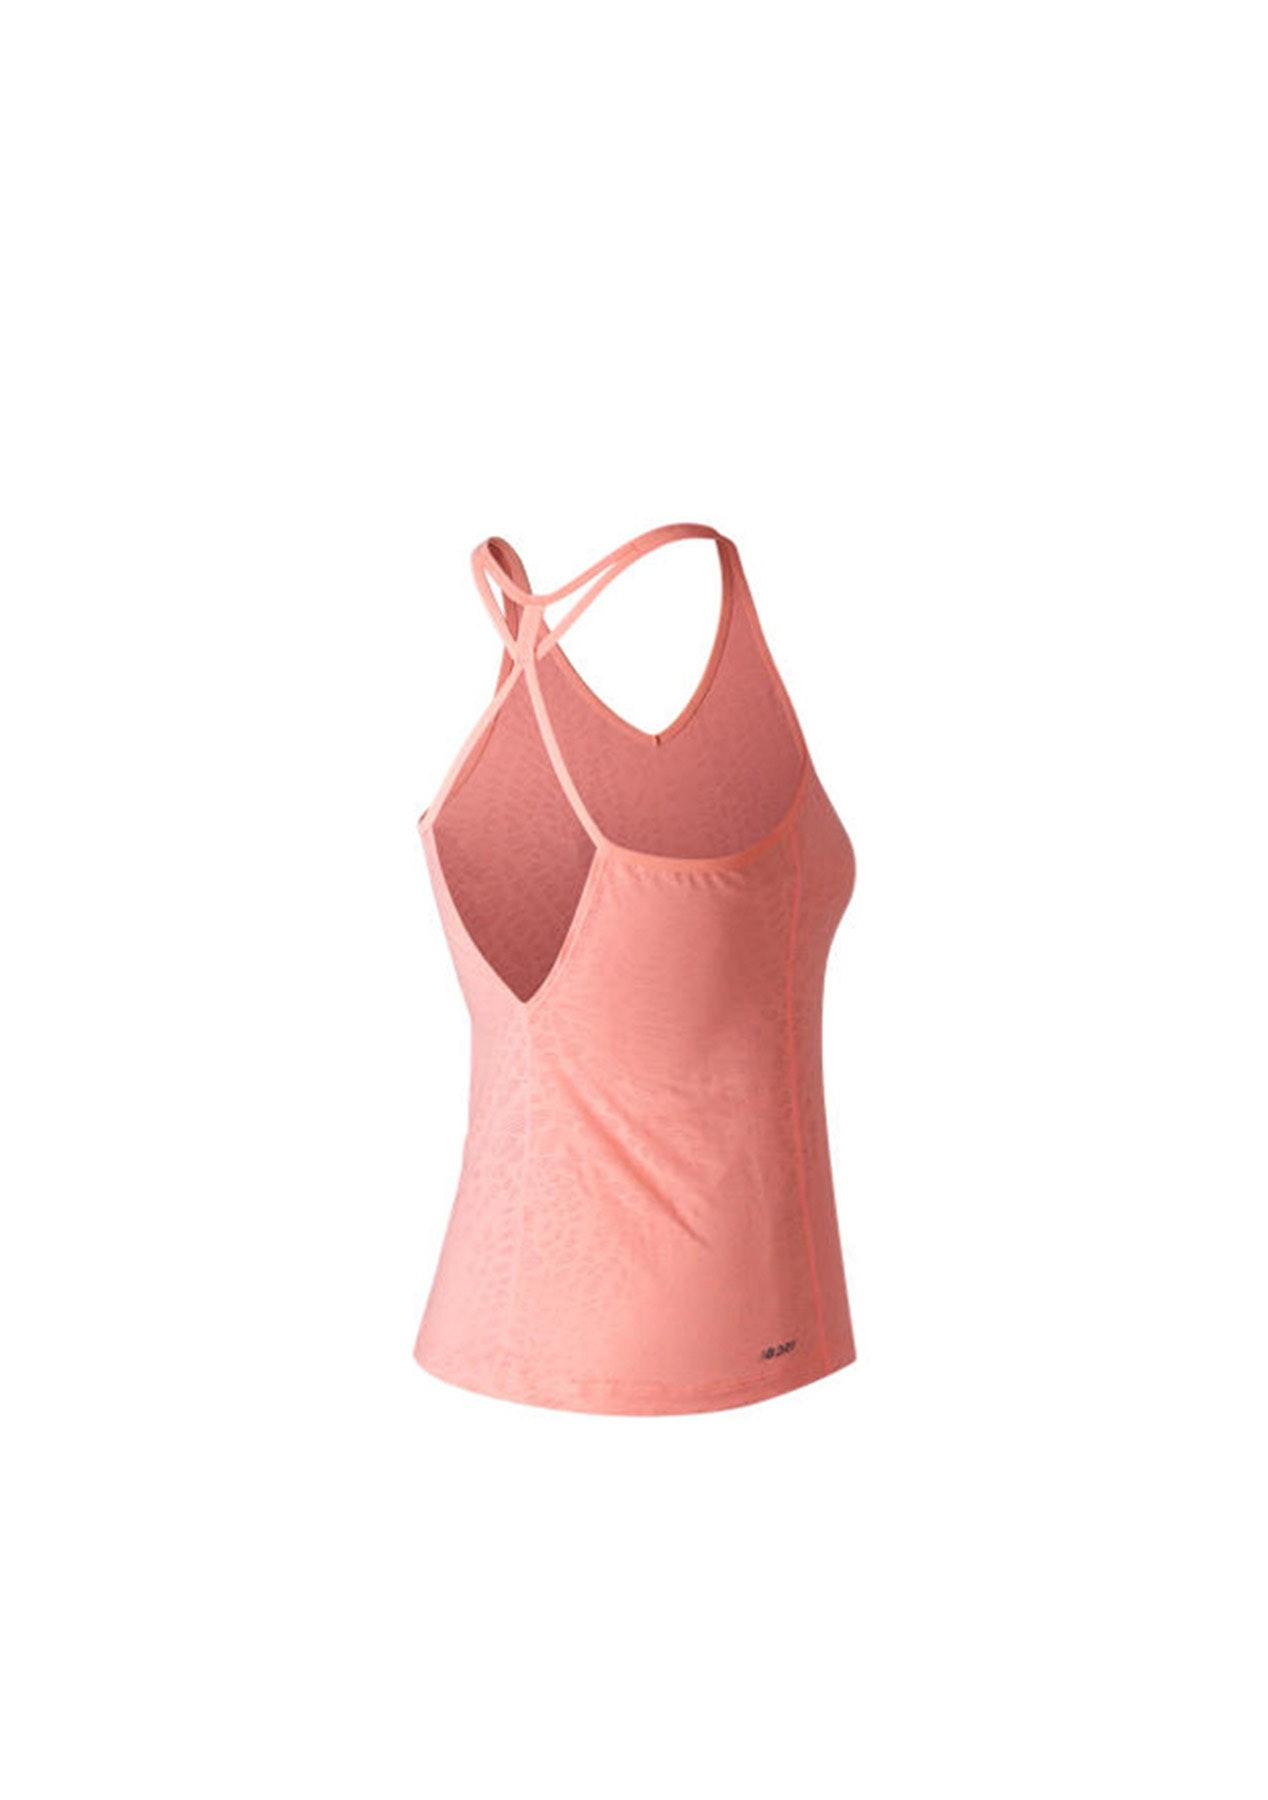 ca4b914611ca5 New Balance Womens - Fashion Tank - Bleached Sunrise - New Balance Womens  Training Edit - Onceit